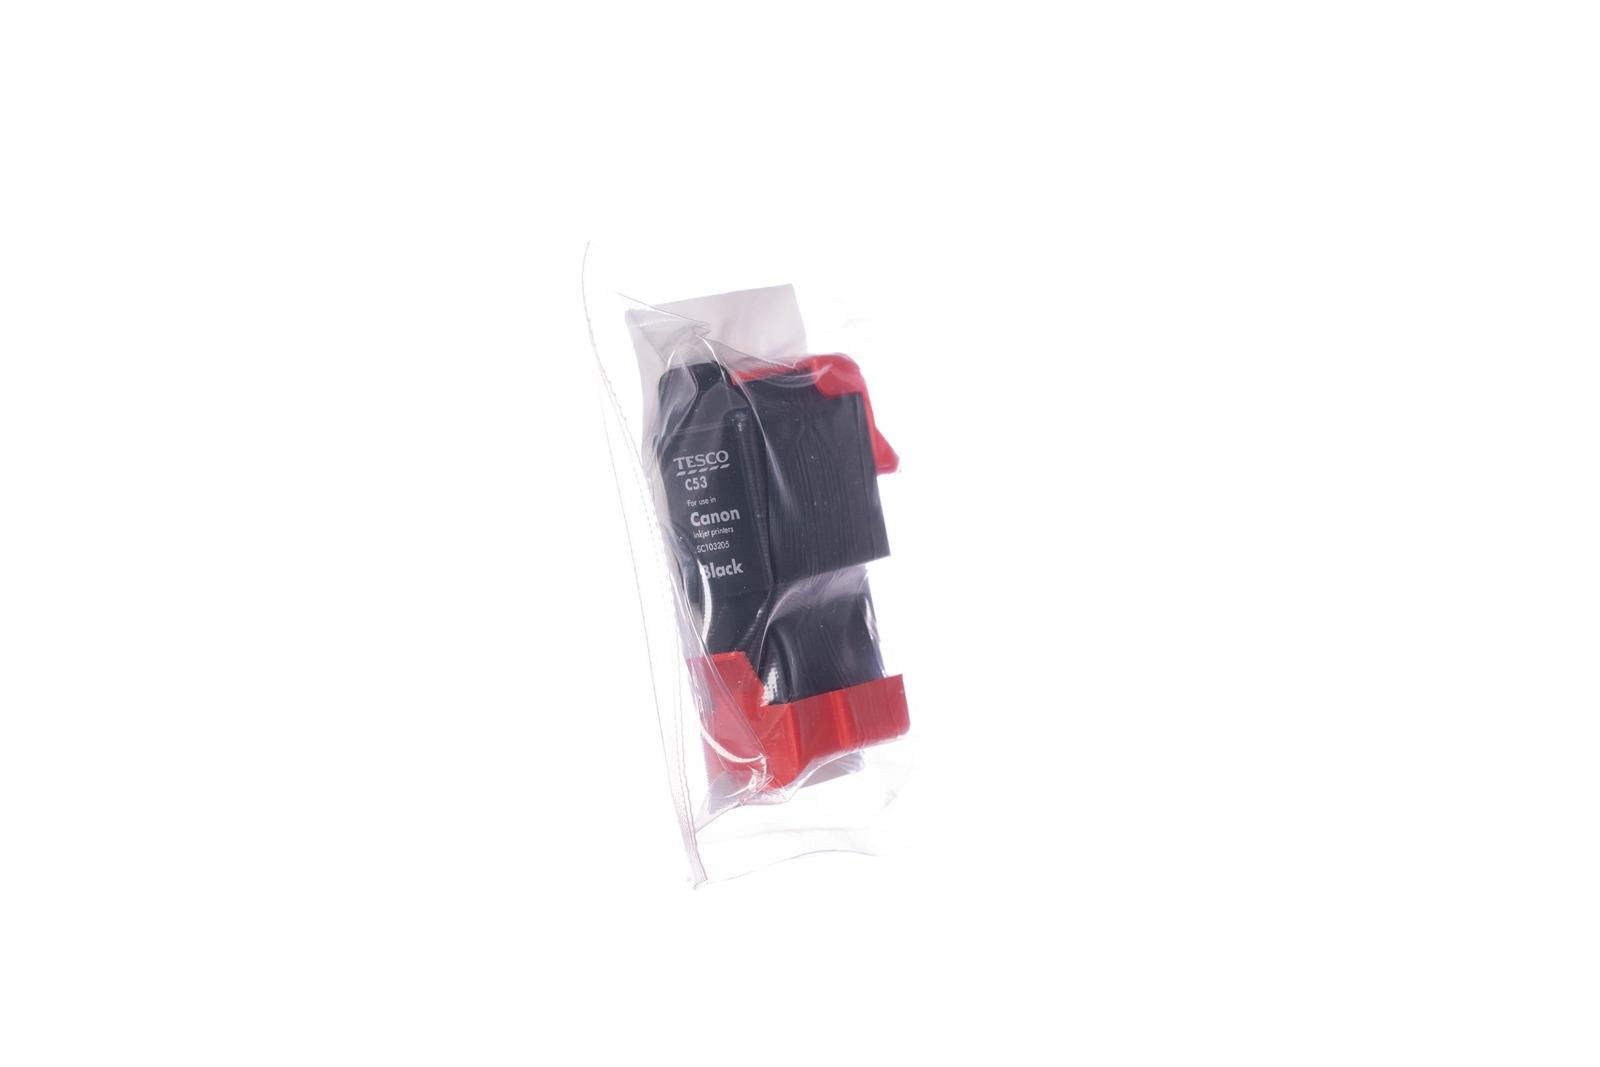 Remanufactured Ink cartridge Tesco Canon C53 Black